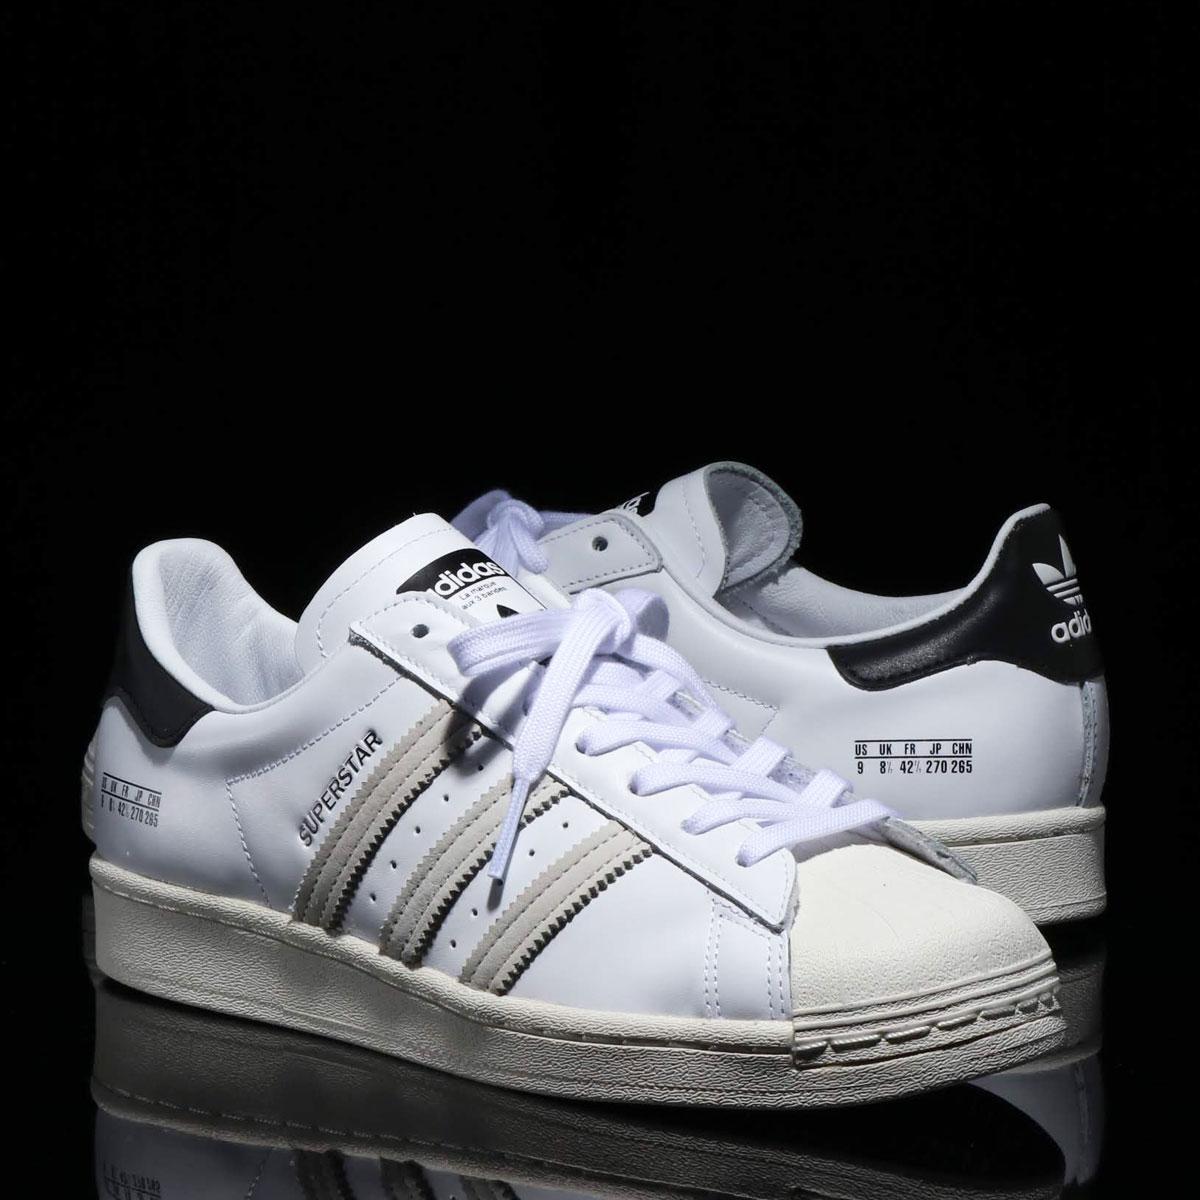 adidas SUPERSTAR(アディダス スーパースター)FOOTWEAR WHITE/FOOTWEAR WHITE/CORE BLACK【メンズ レディース スニーカー】20SS-I